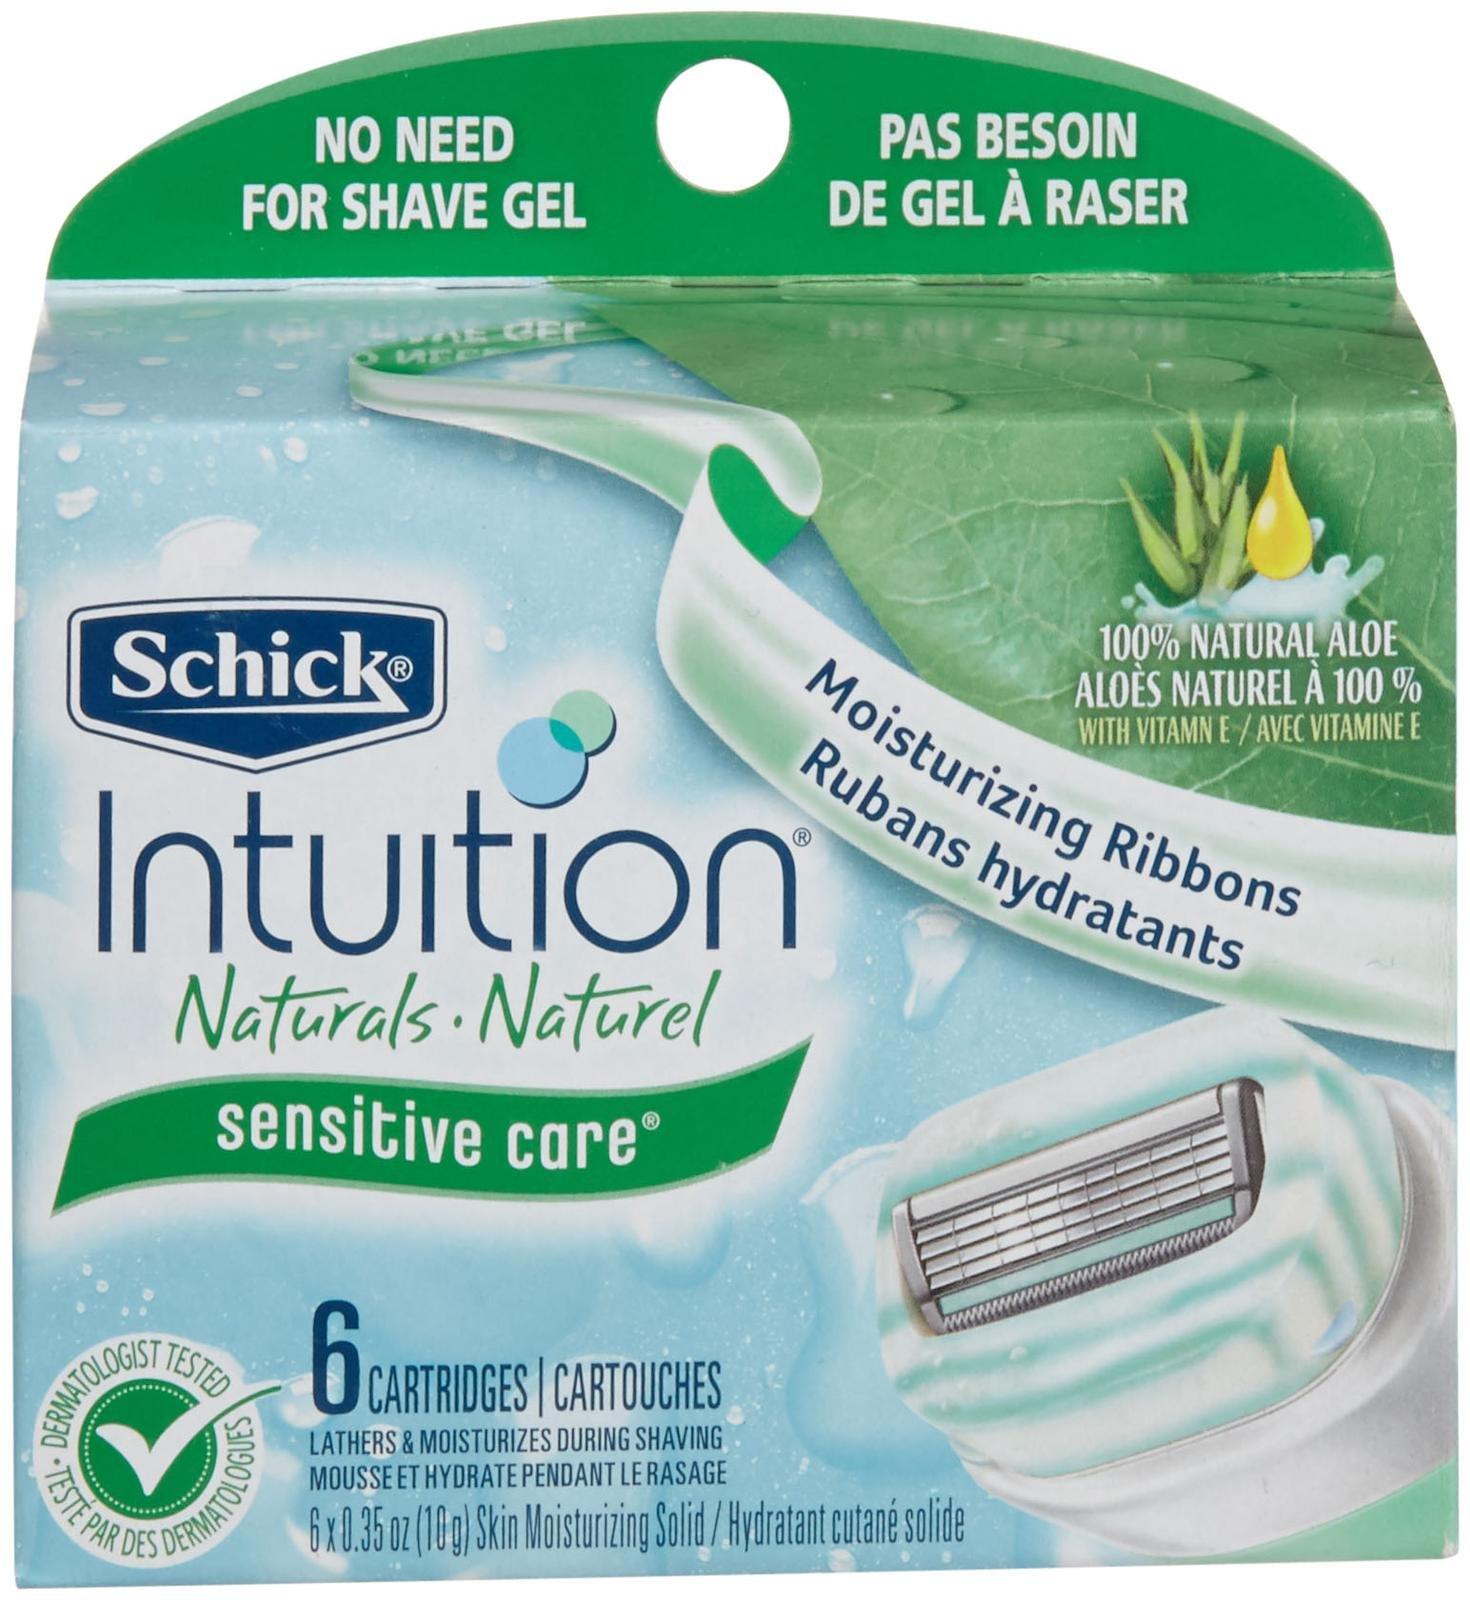 Schick Intuition Naturals Sensitive Care Razor Cartridges, 6 count